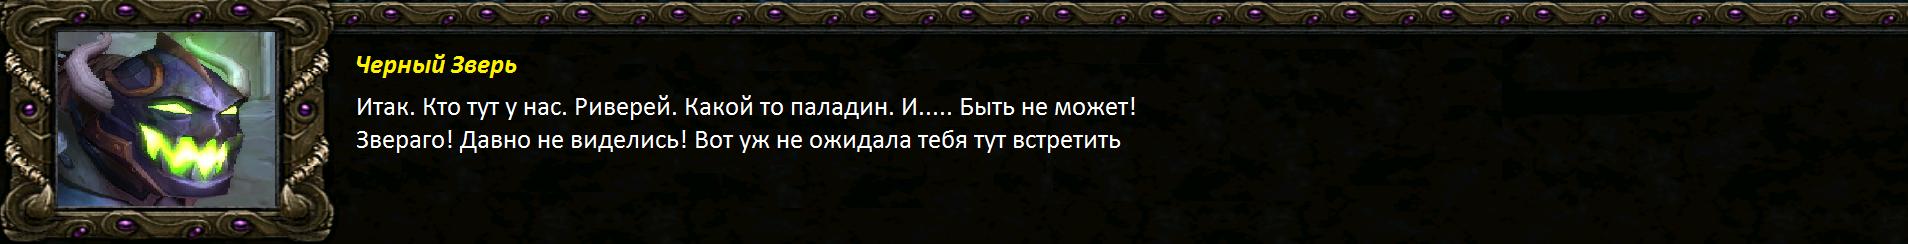 Диалог ДкВар 12 эпизод 03